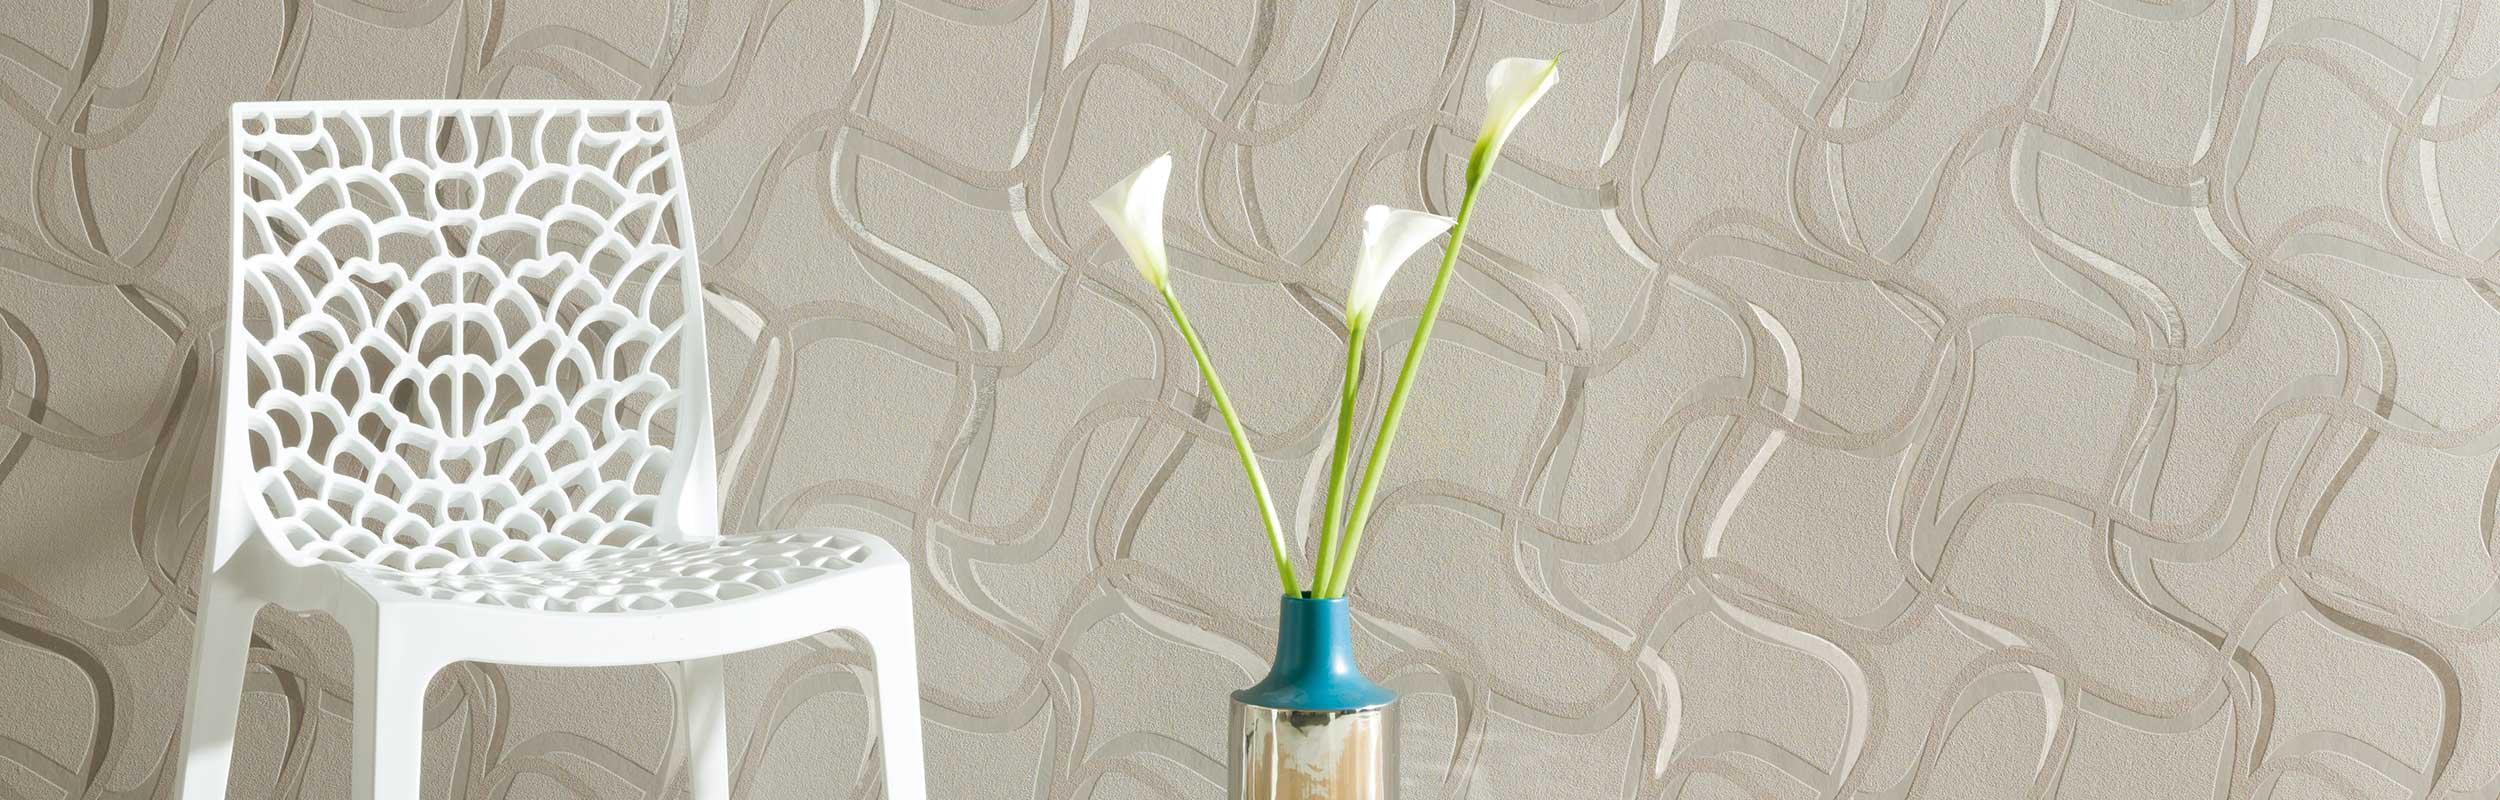 filino headerbild web erismann cie gmbh. Black Bedroom Furniture Sets. Home Design Ideas